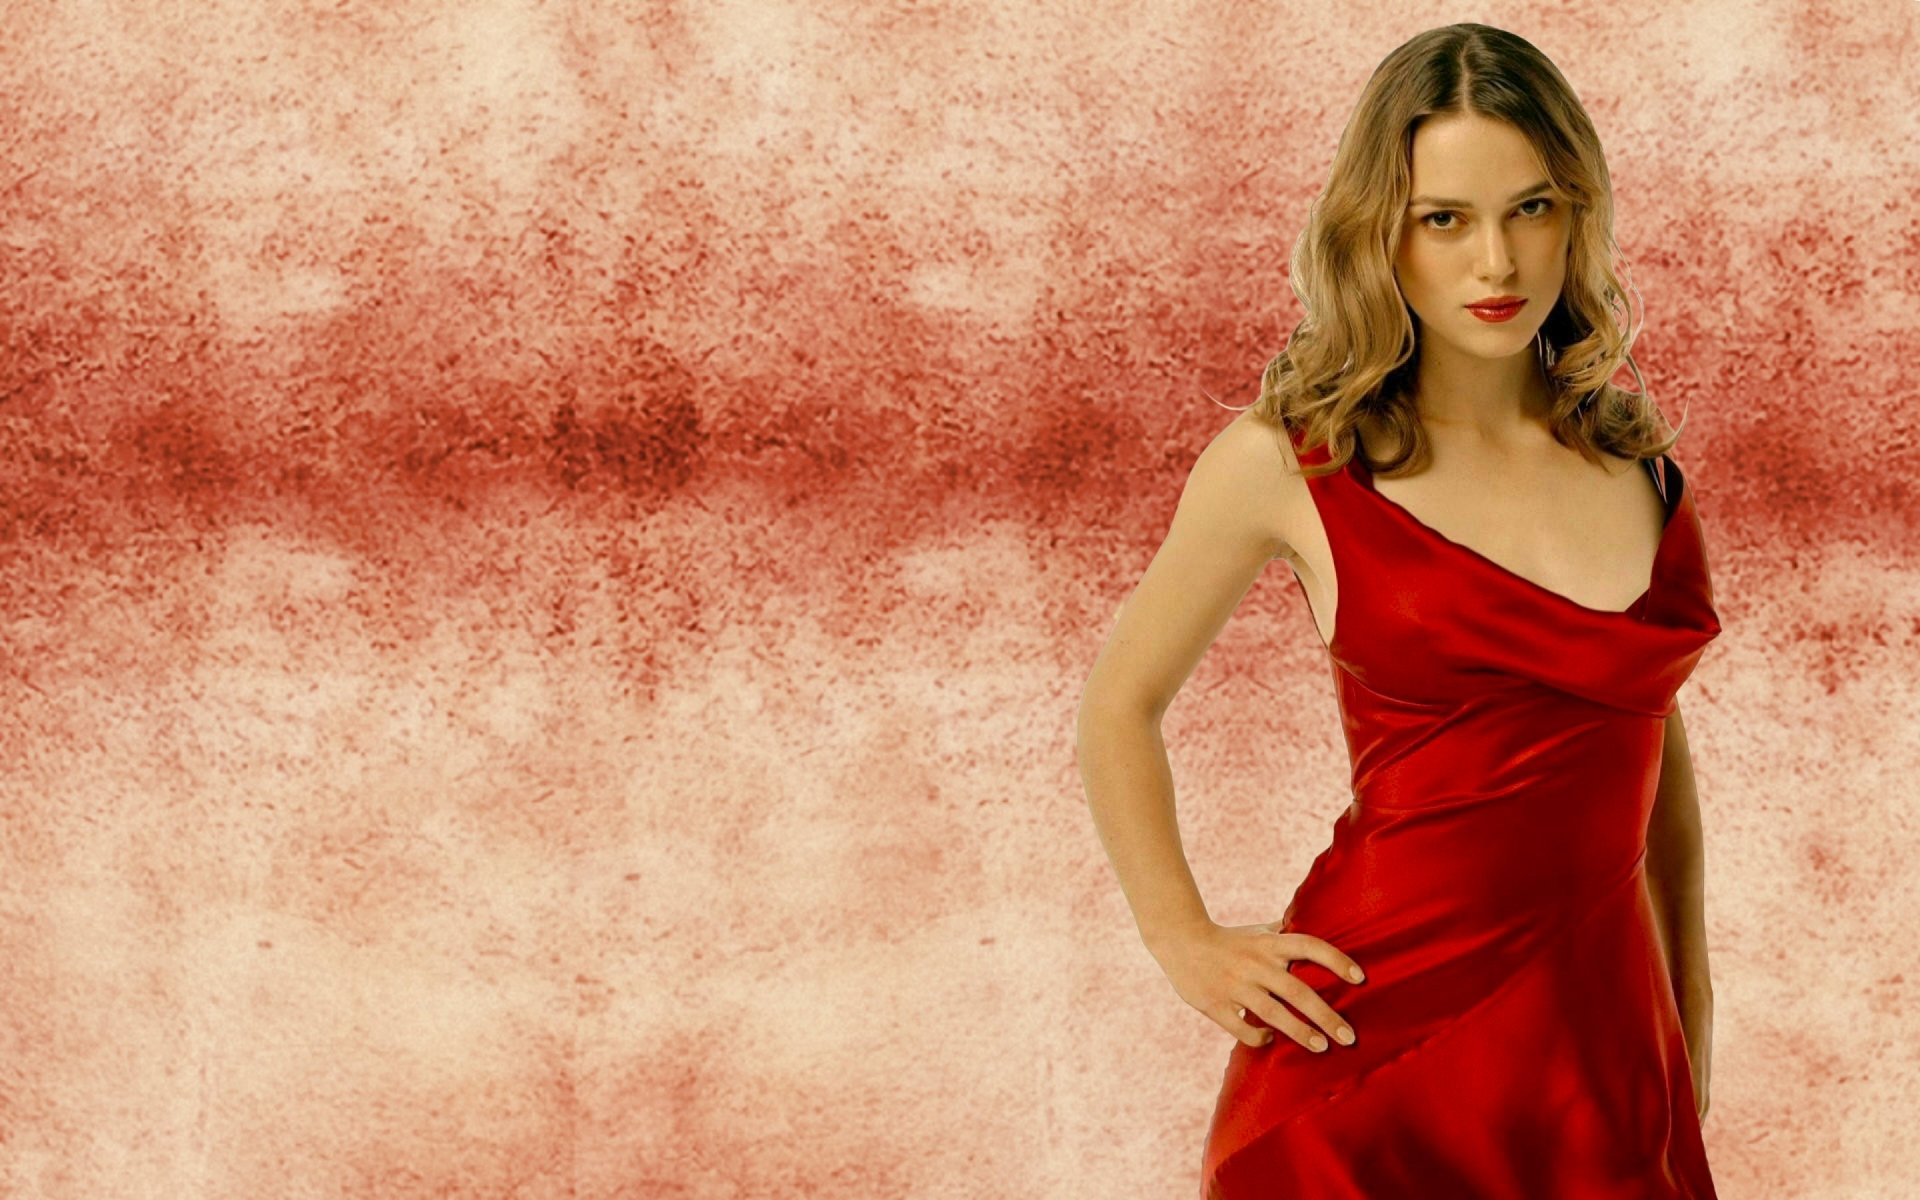 Celebrity - Keira Knightley  Night Red Wallpaper